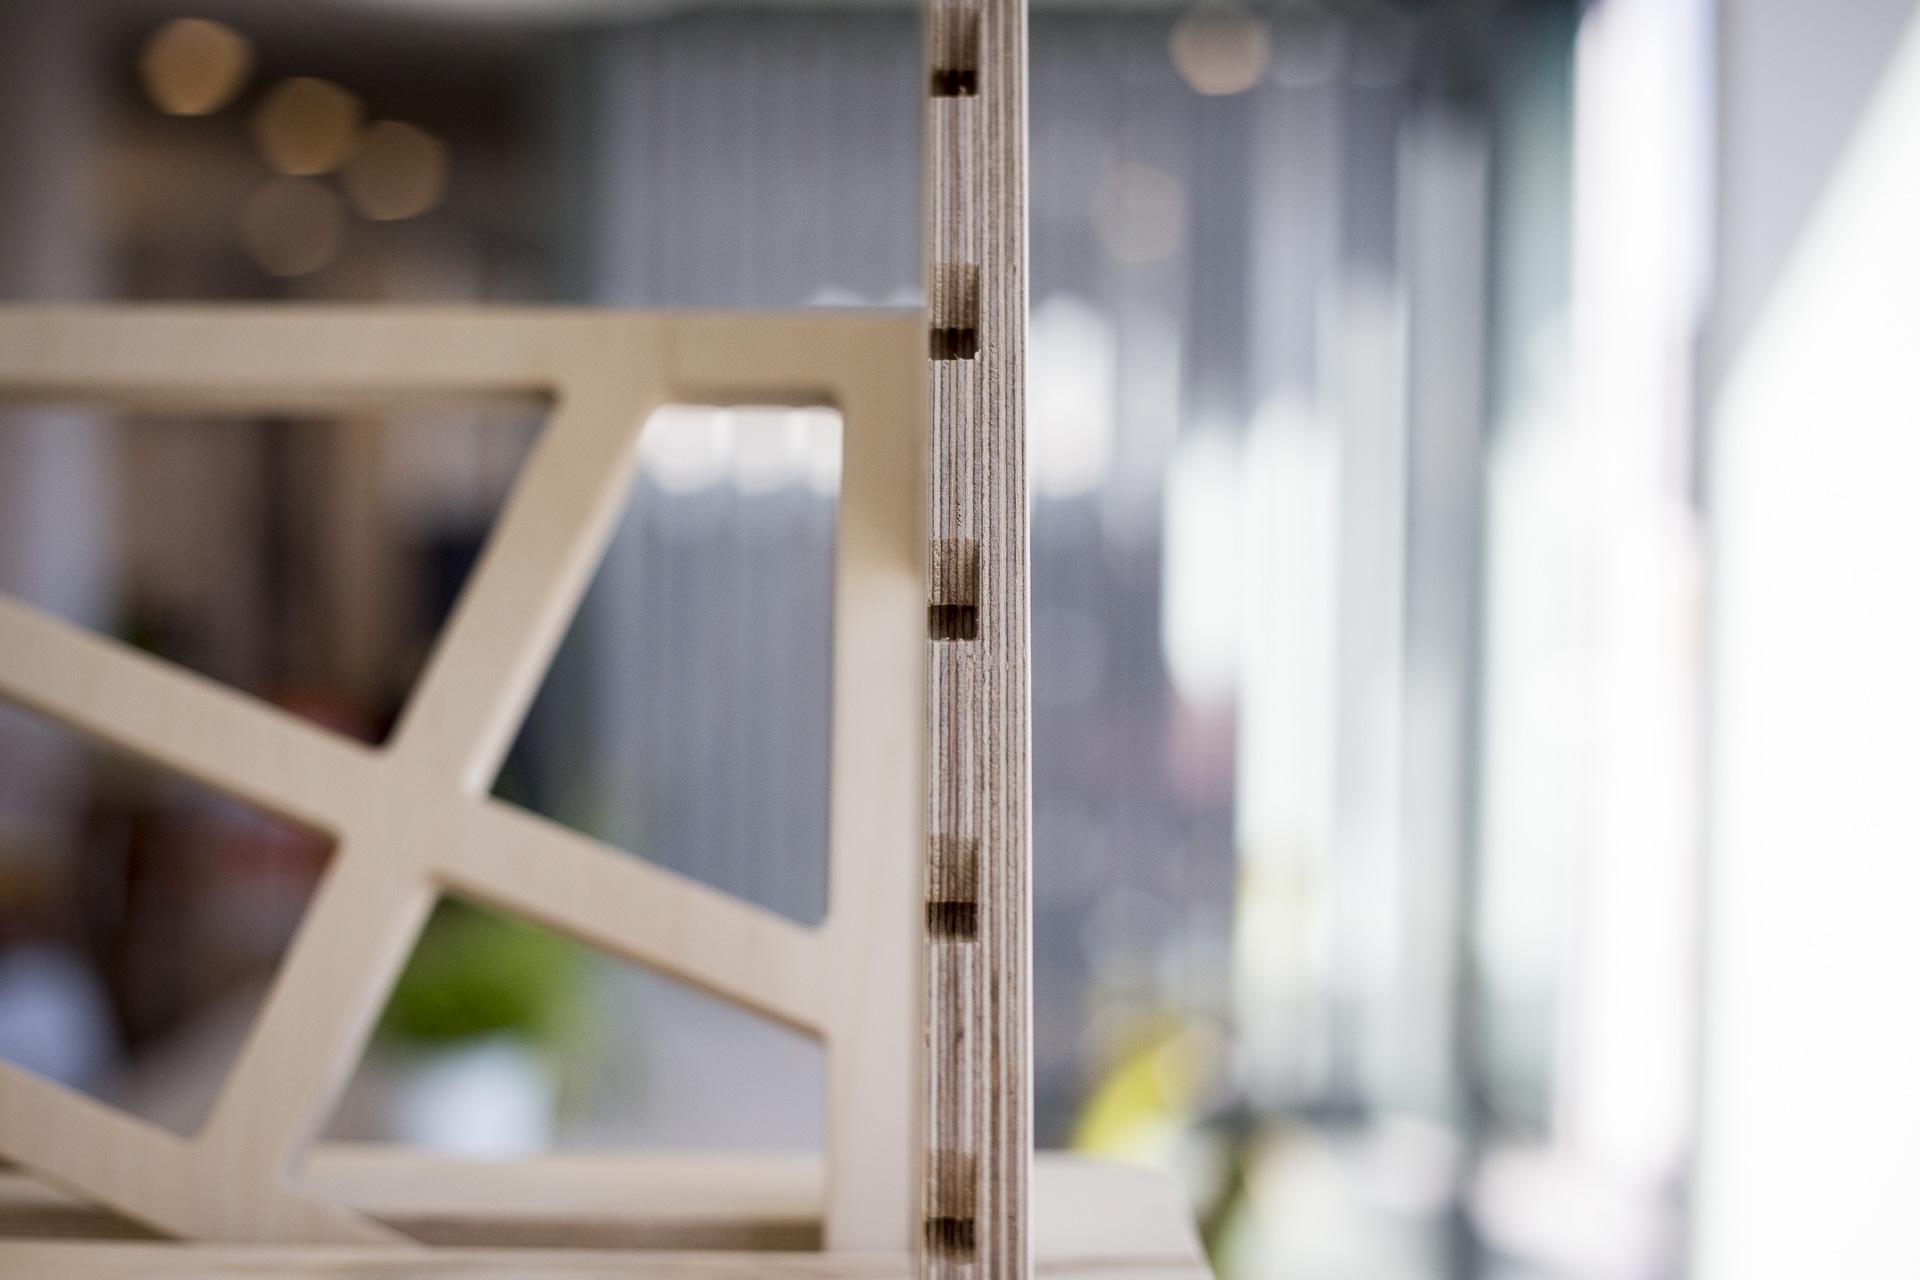 Height adjustable shelf desk notches